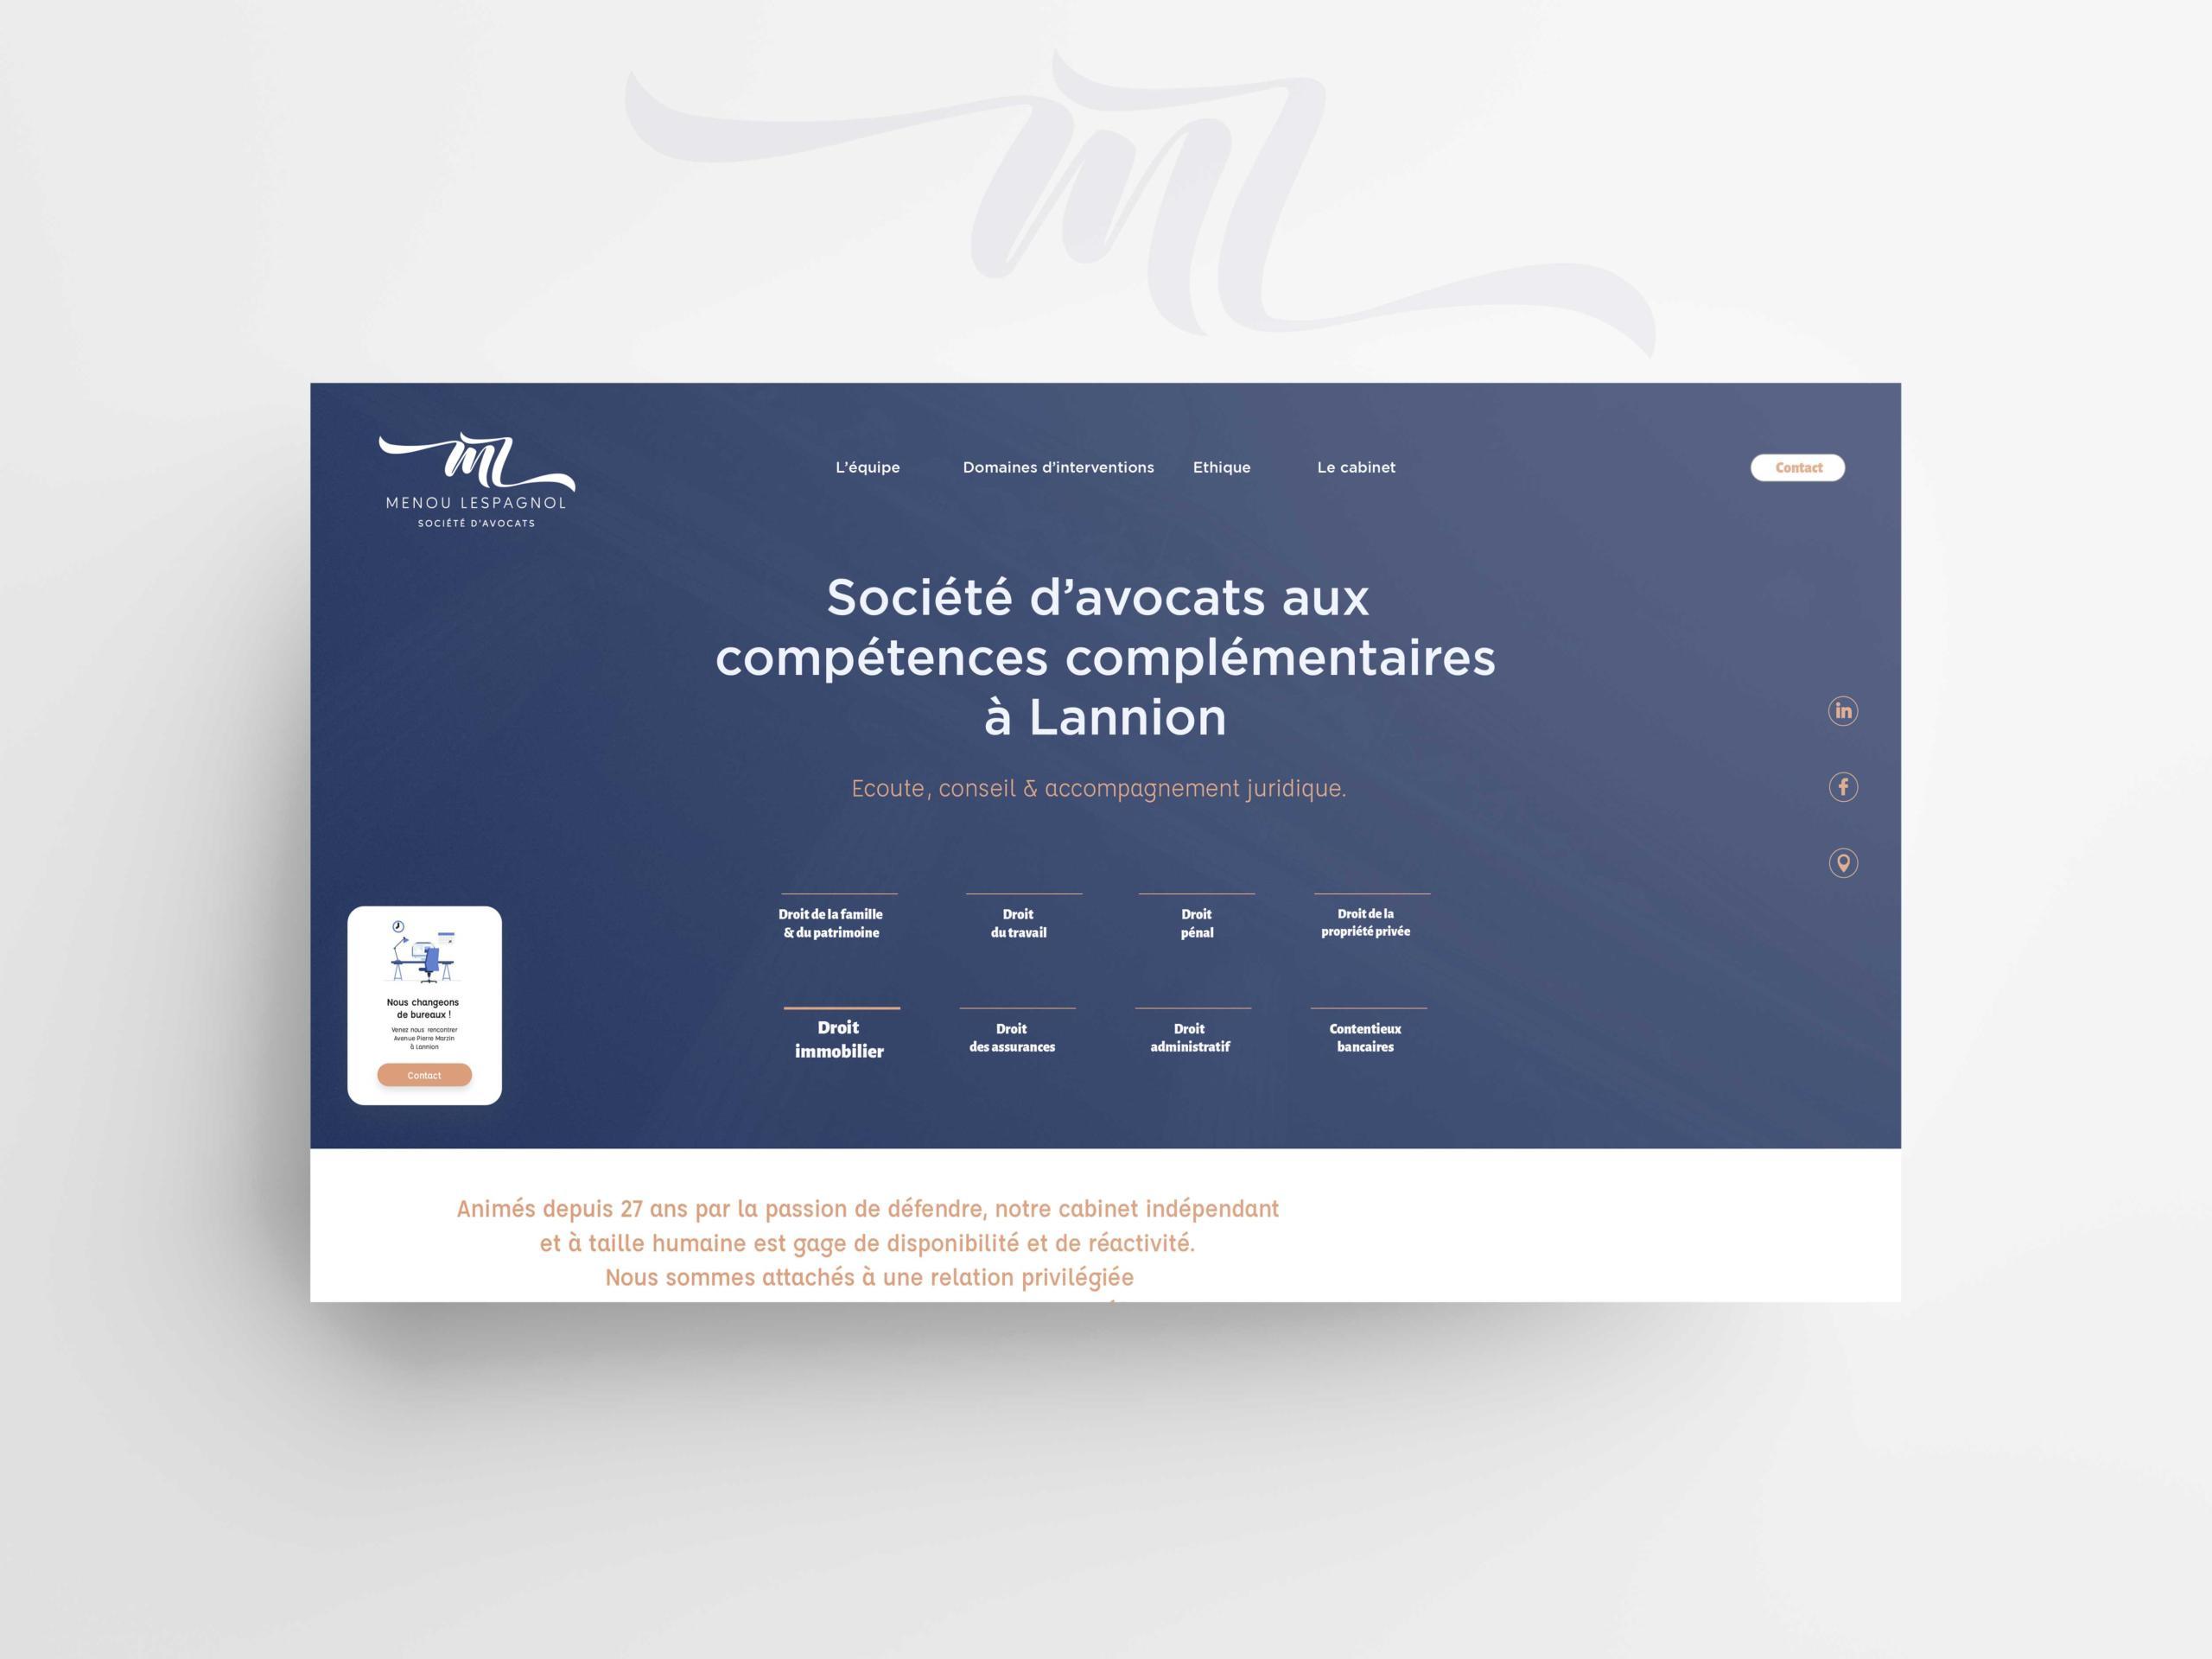 menou-lespagnol-site-internet)-entreprise-coqueliko-roudenn-lannion